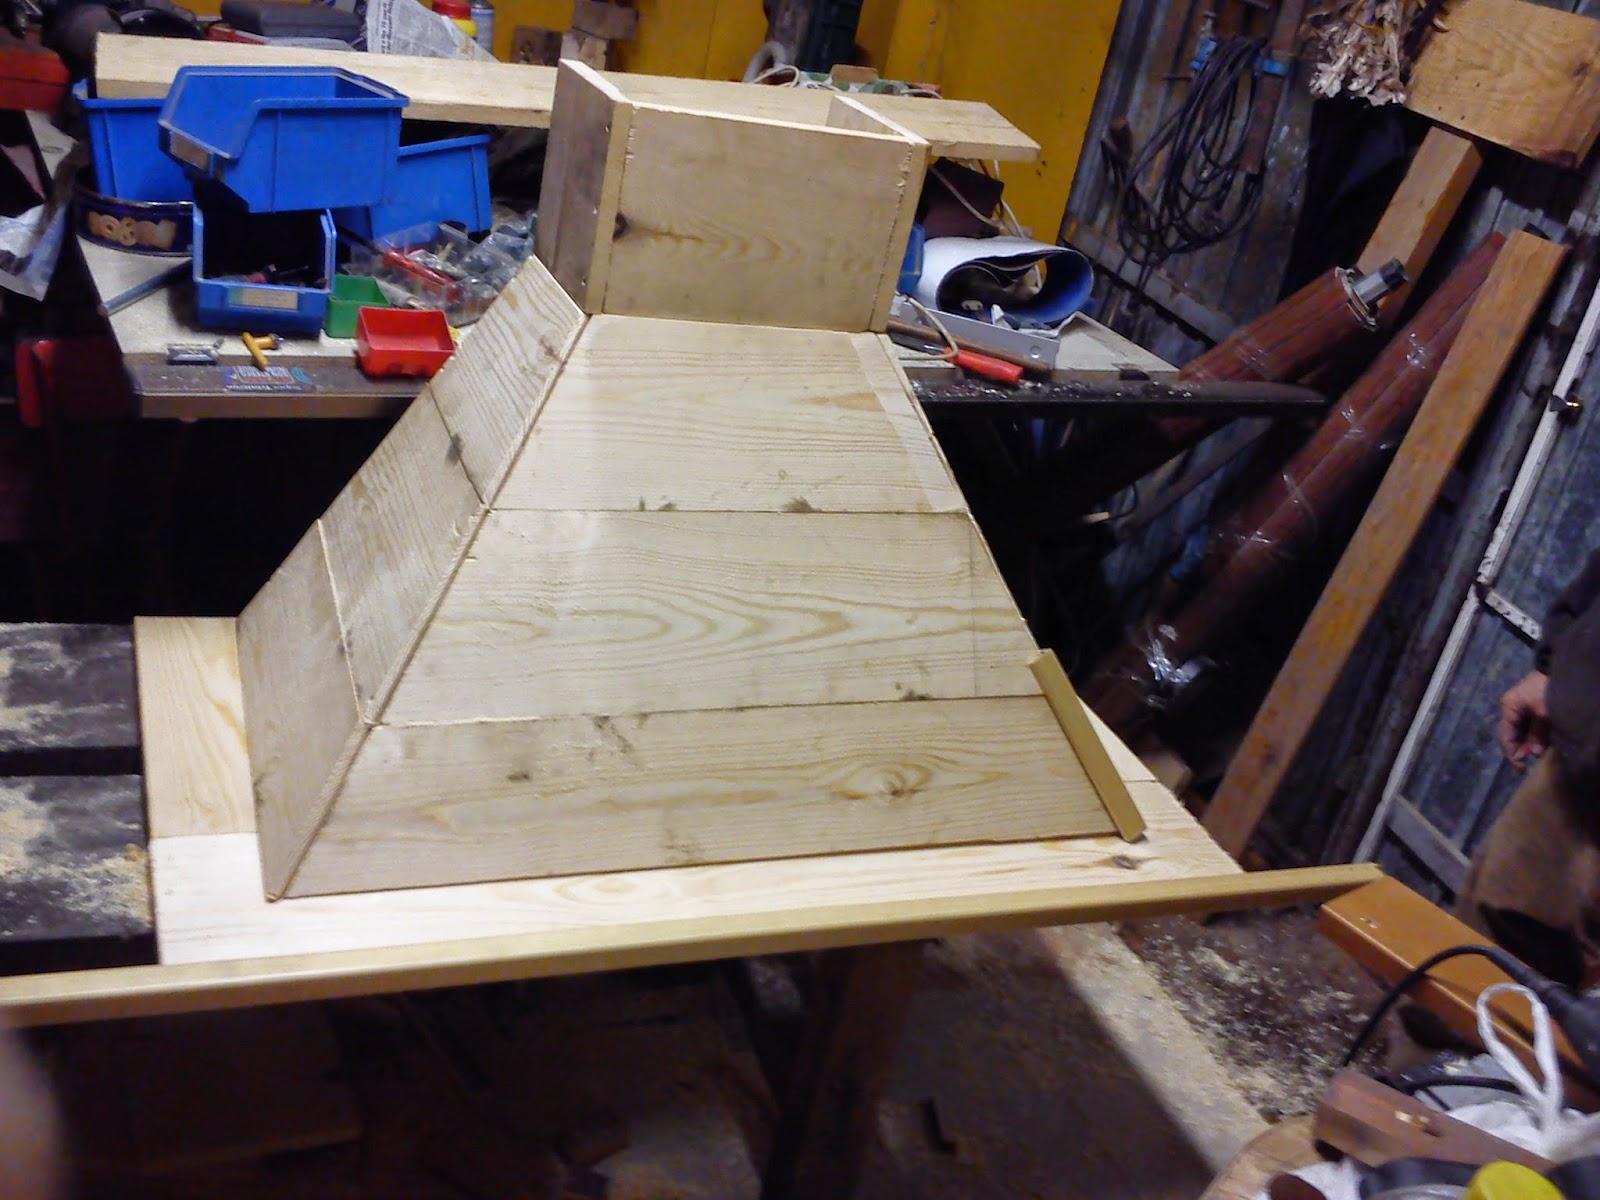 Mis inventos campana extractora casera - Masilla para madera casera ...